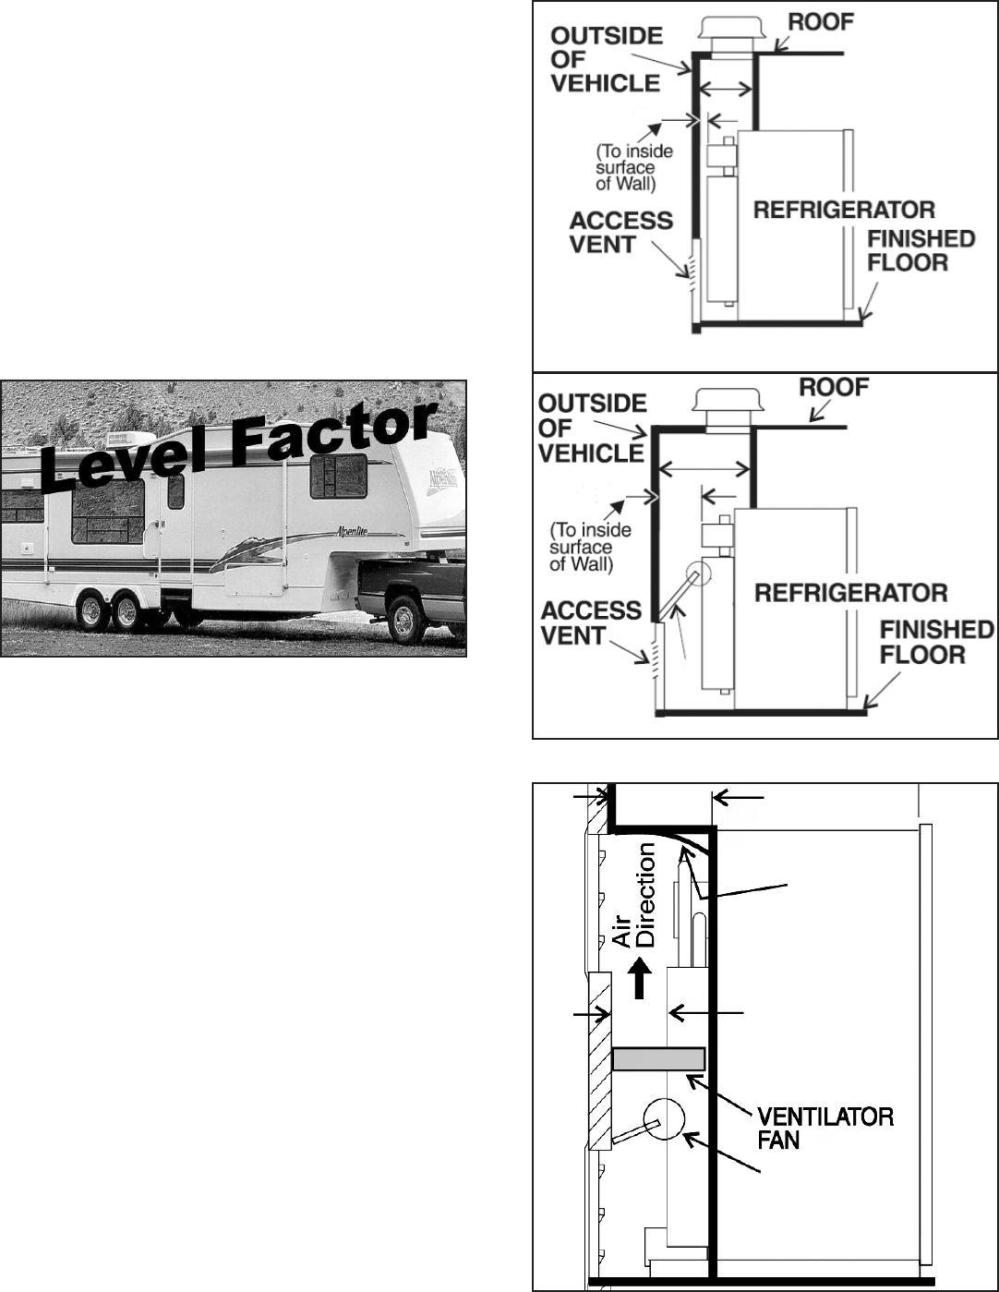 medium resolution of  wiring diagram rv refrigerator dometic rm 2351 rm 2354 rm 2451 rm 2454 rm 2551